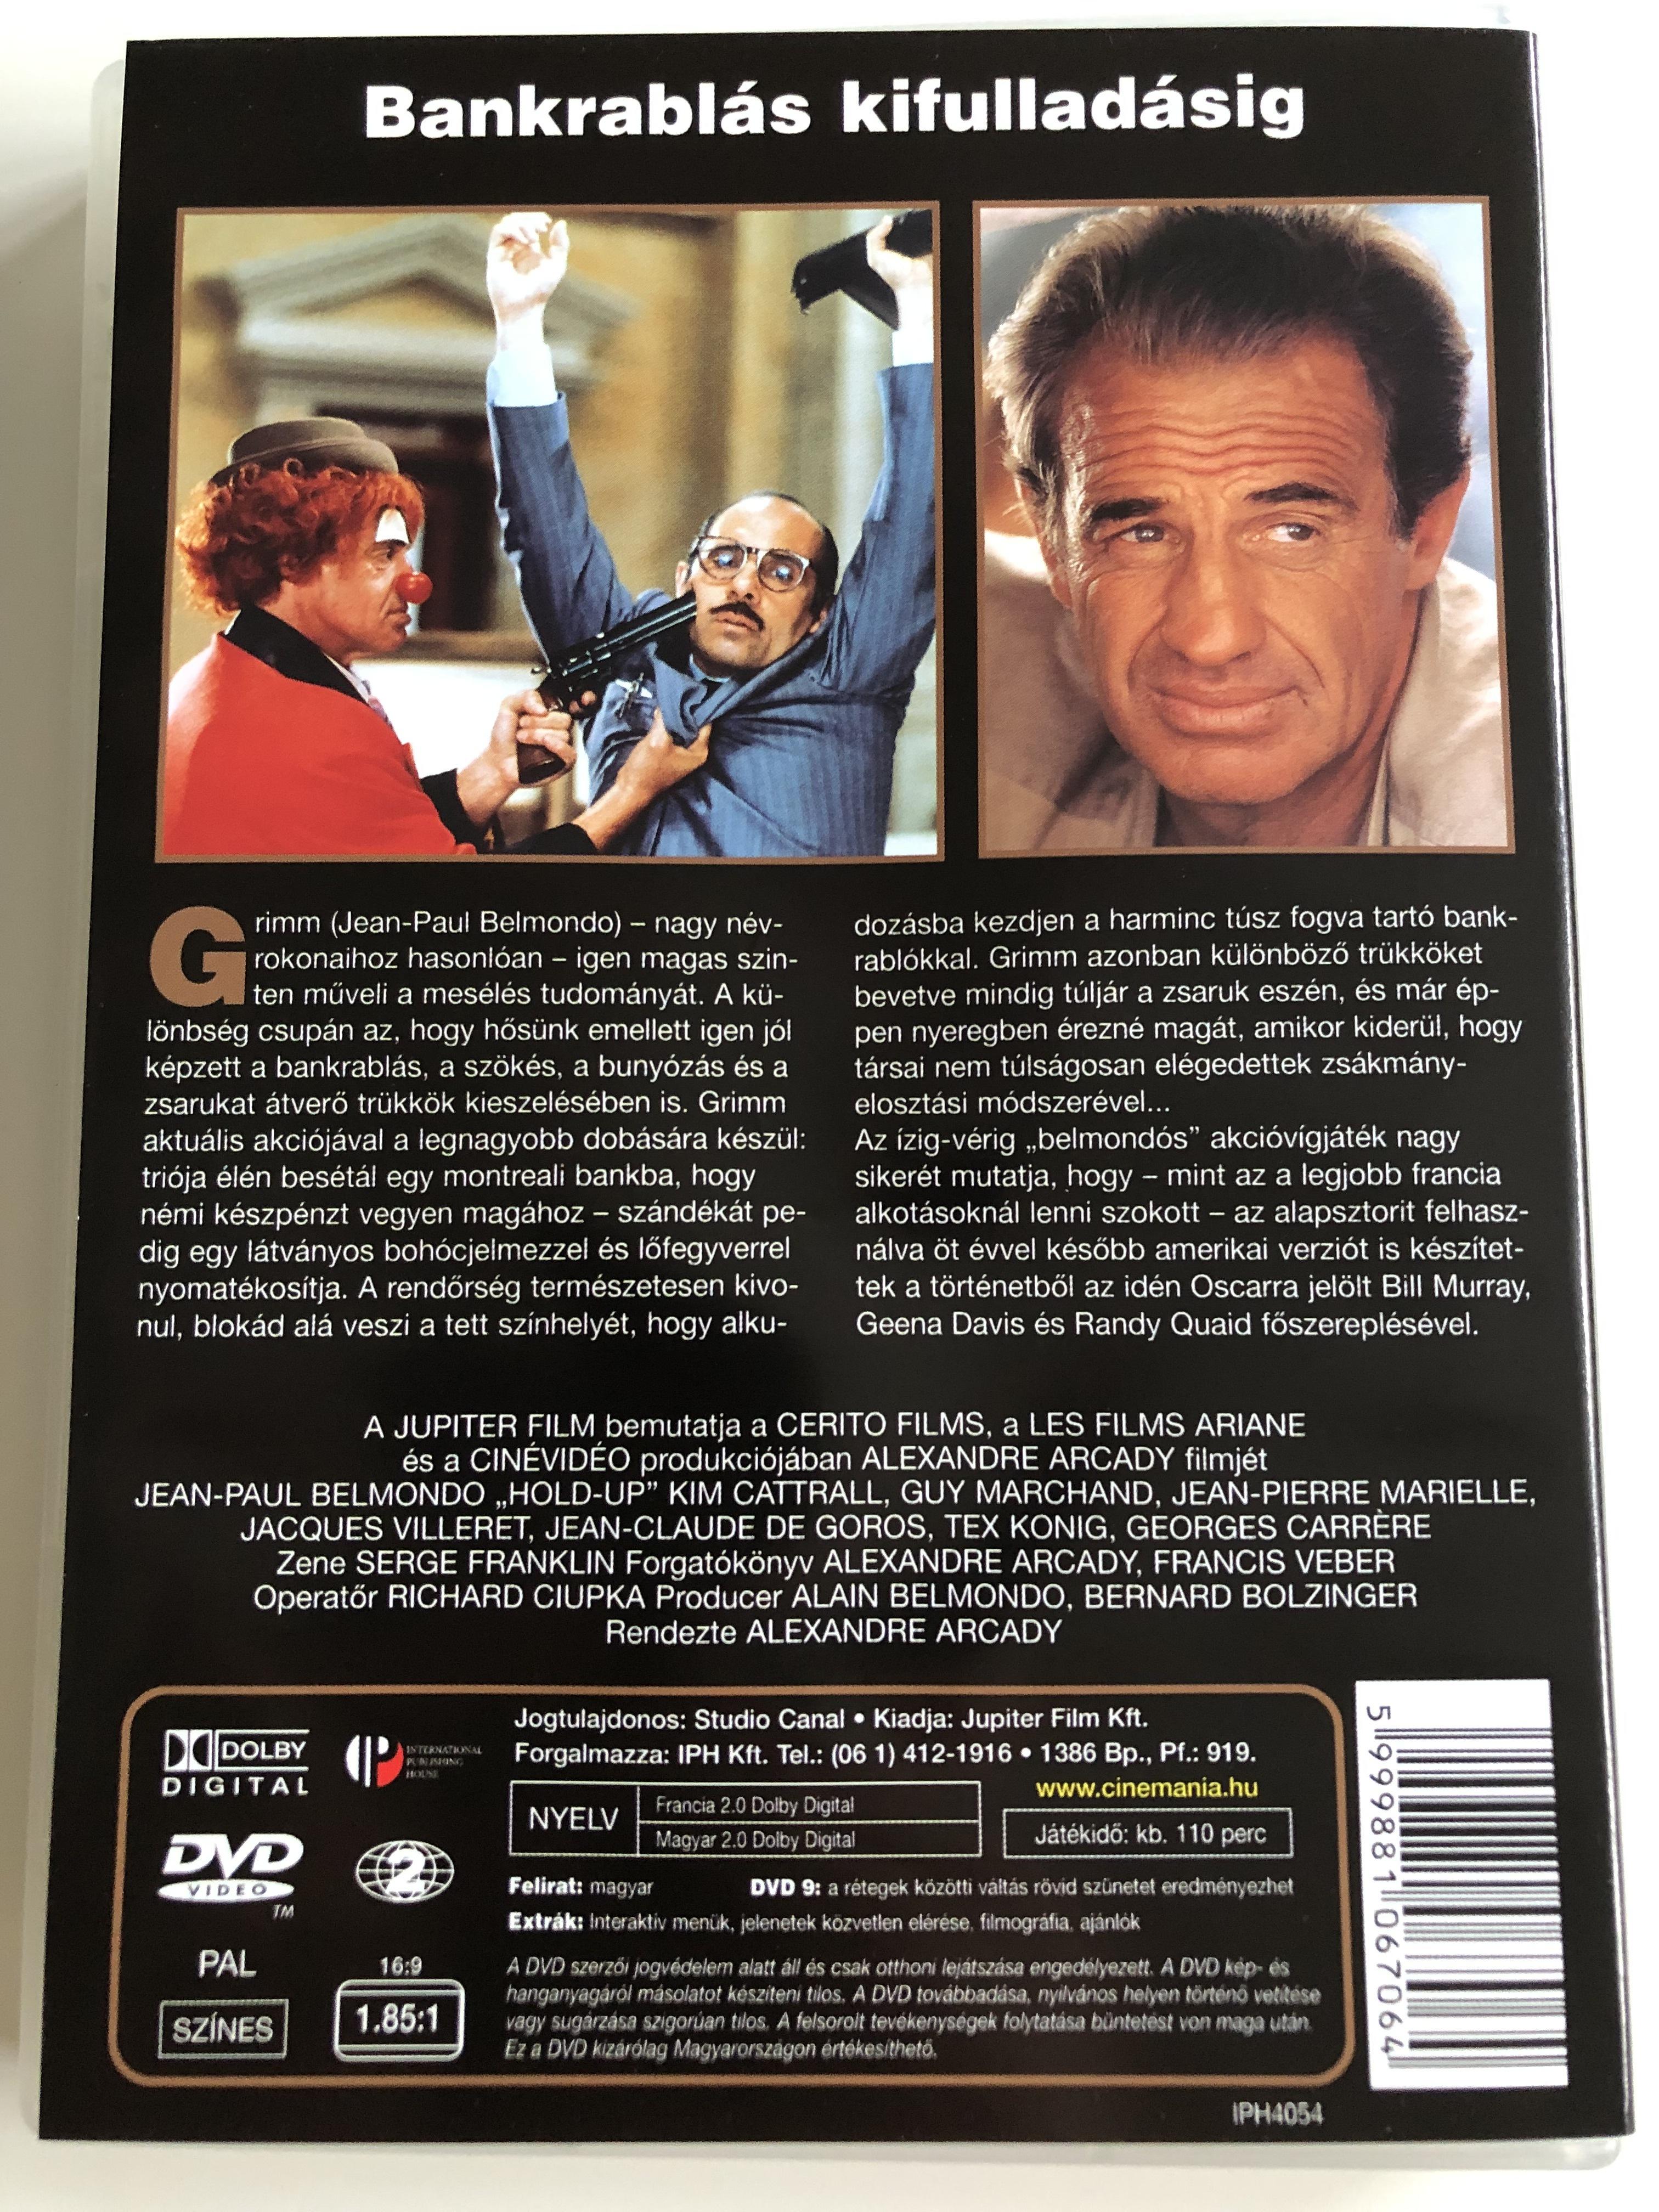 hold-up-dvd-1985-montreali-bankrabl-s-directed-by-alexandre-arcady-belmondo-series-pt.-3-starring-jean-paul-belmondo-kim-cattrall-guy-marchand-jean-pierre-marielle-2-.jpg